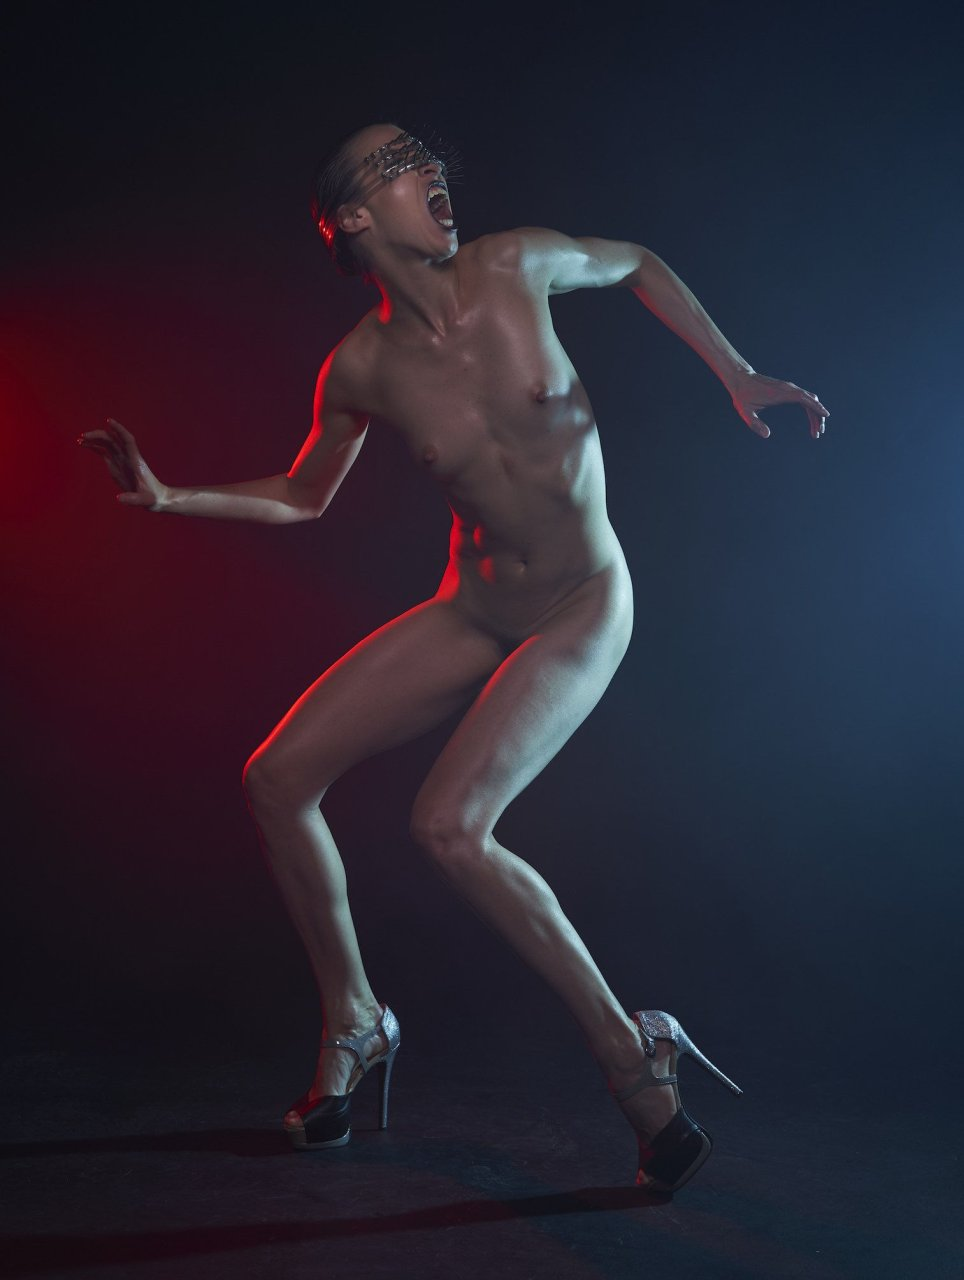 Emily Ratajkowski Nude Photos Color Corrected forecast